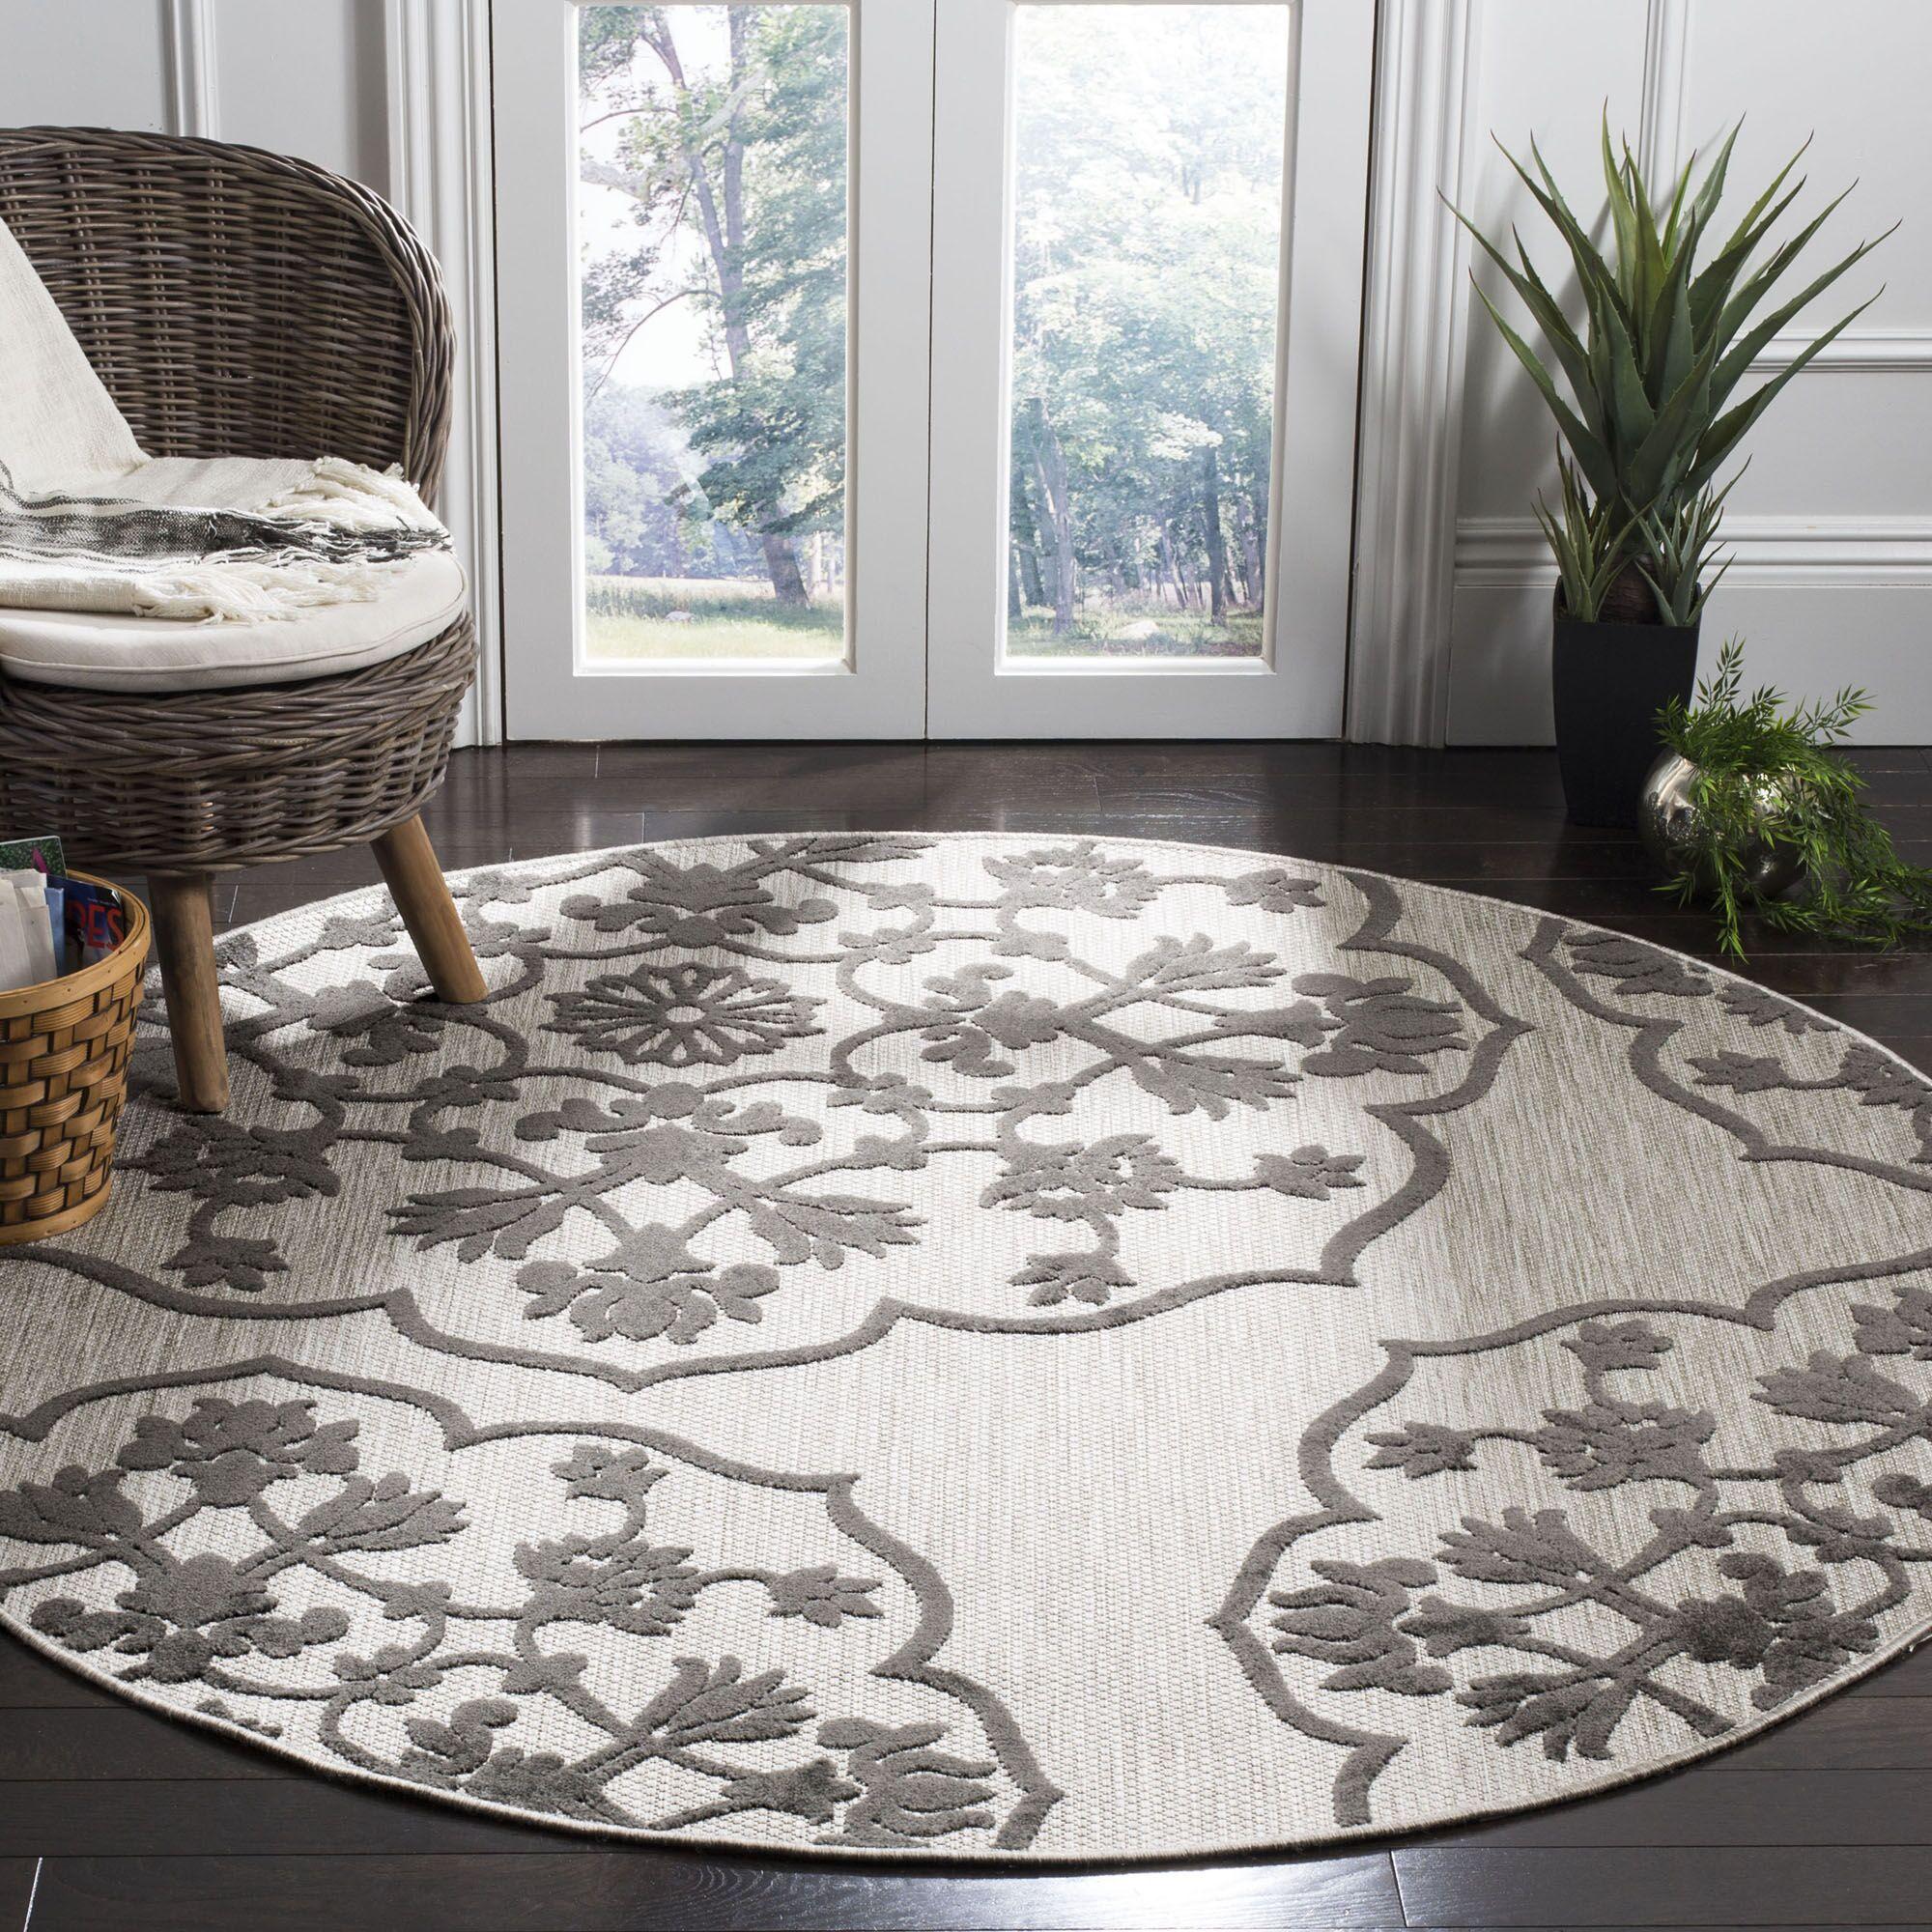 Oakmont Indoor/Outdoor Area Rug Rug Size: Round 6'7